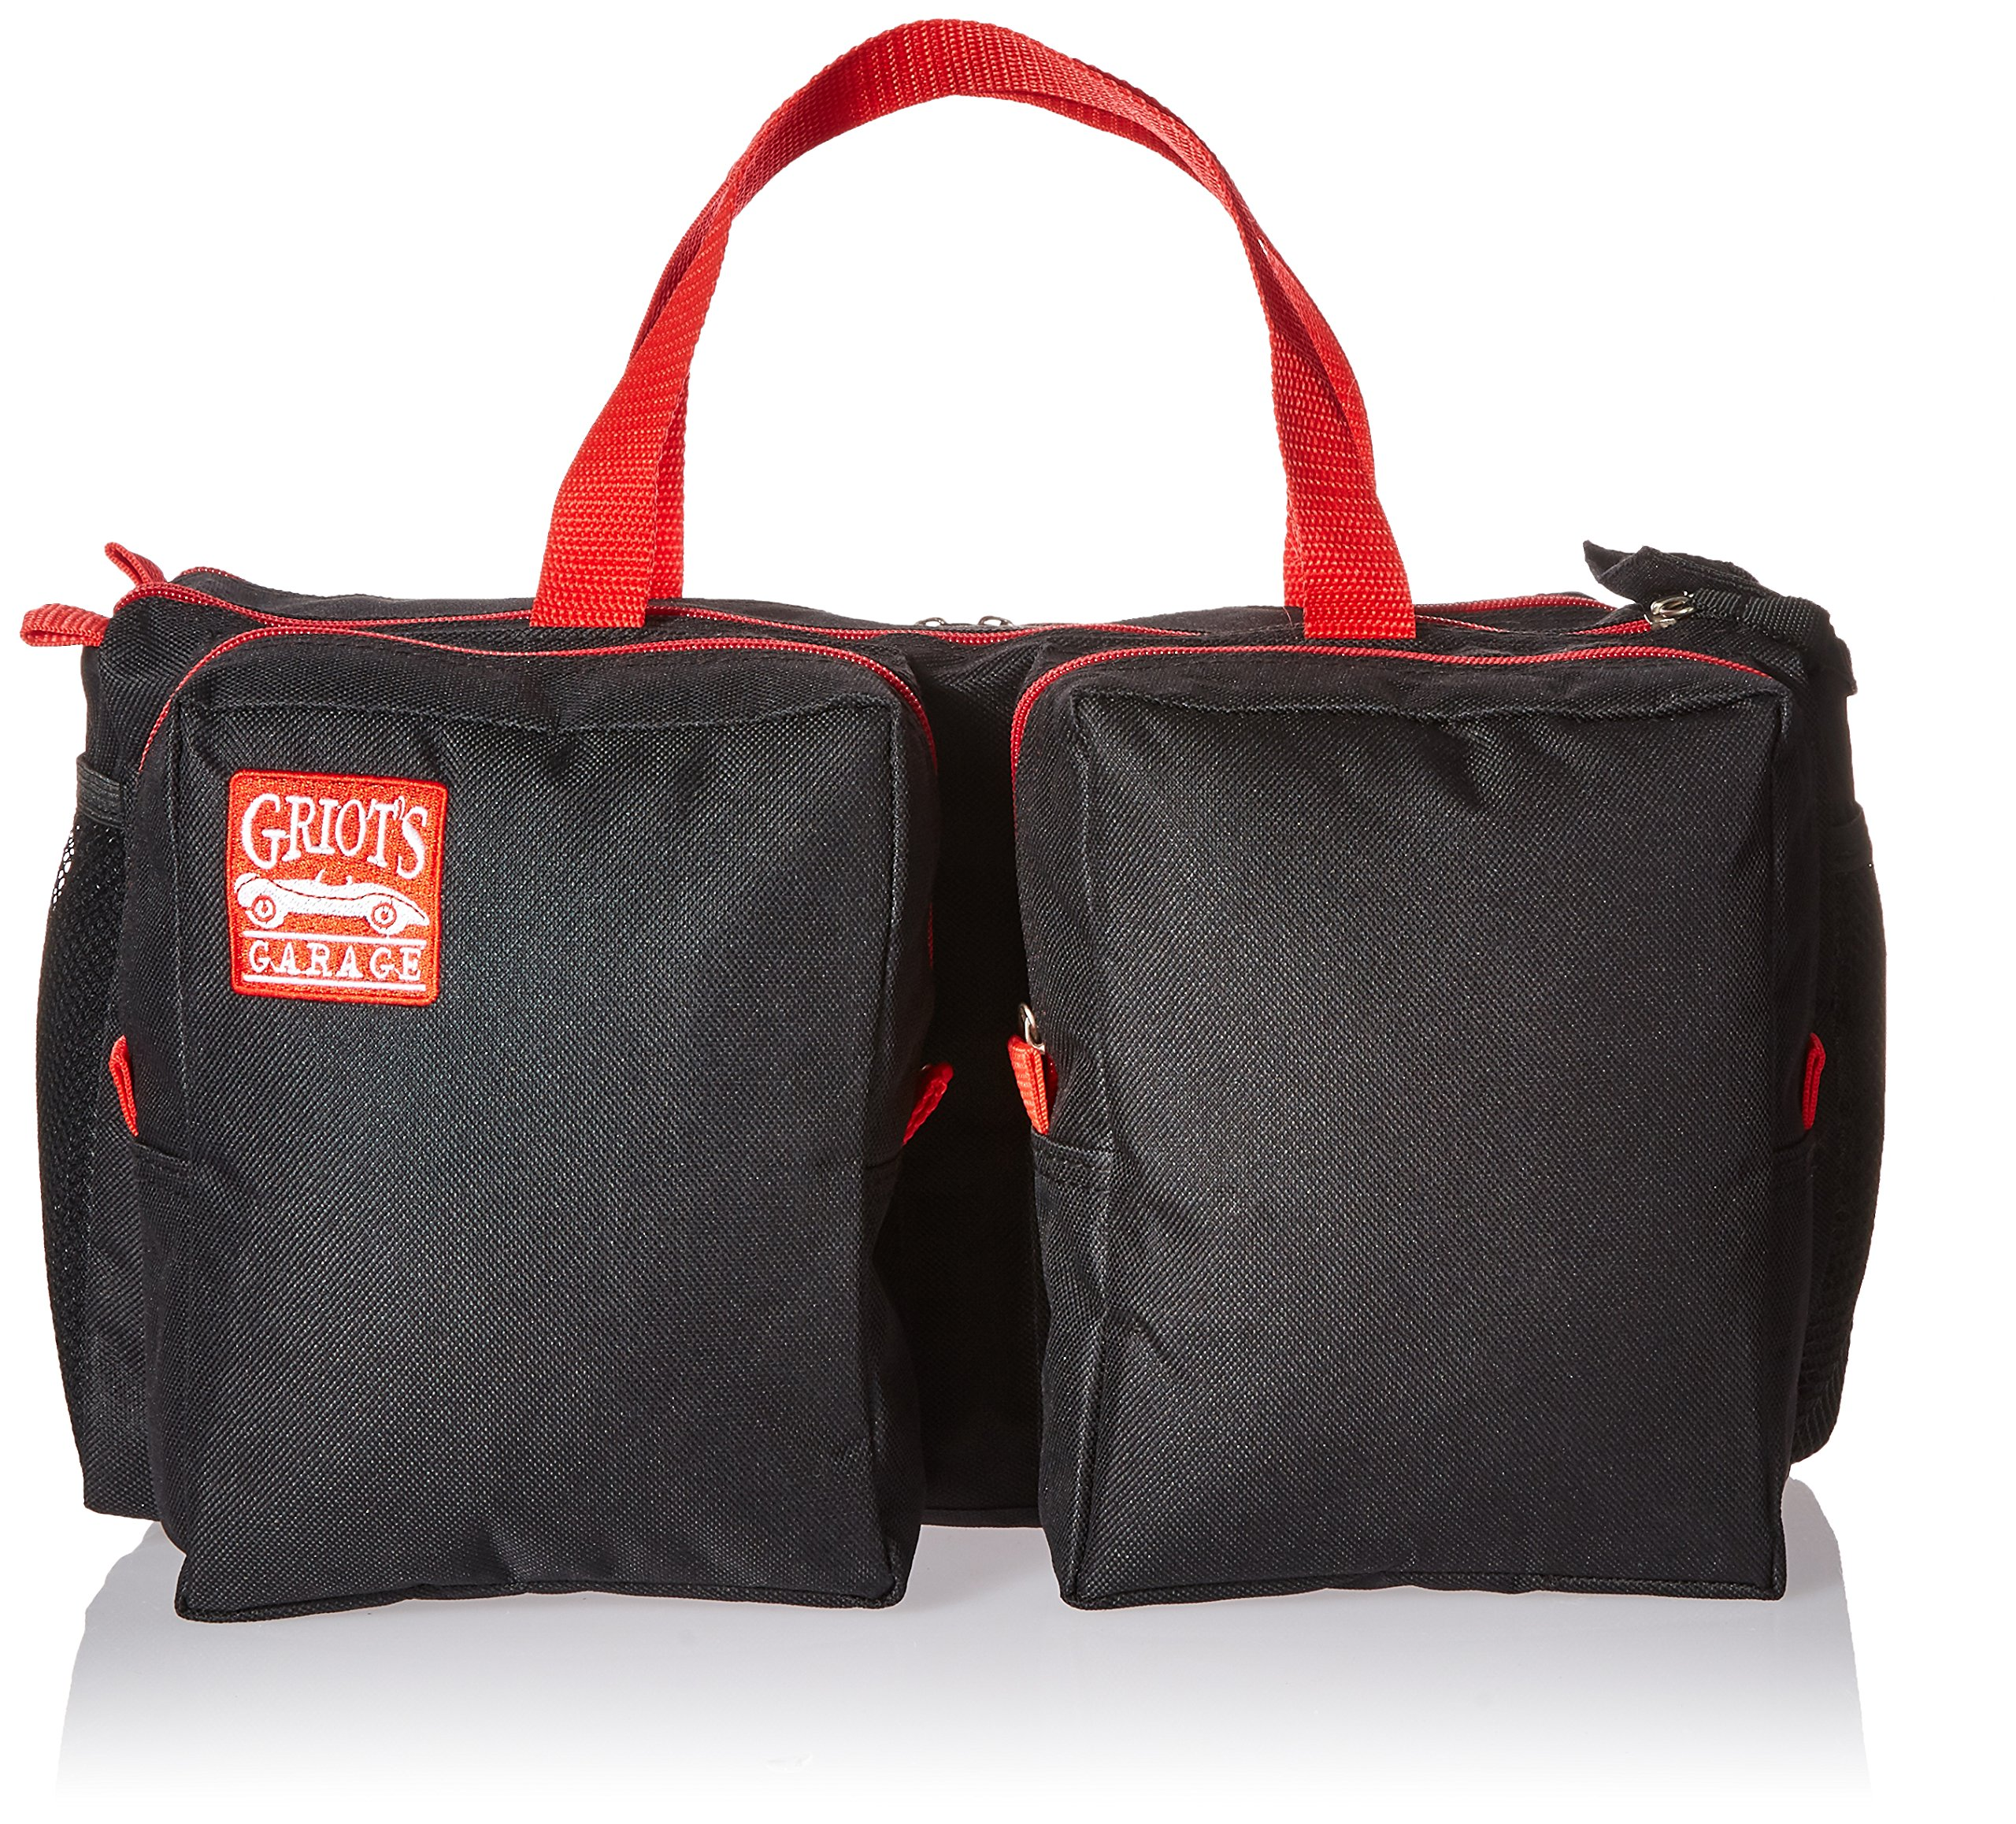 Griot's Garage 77843 Water Resistant Trunk Bag by Griot's Garage